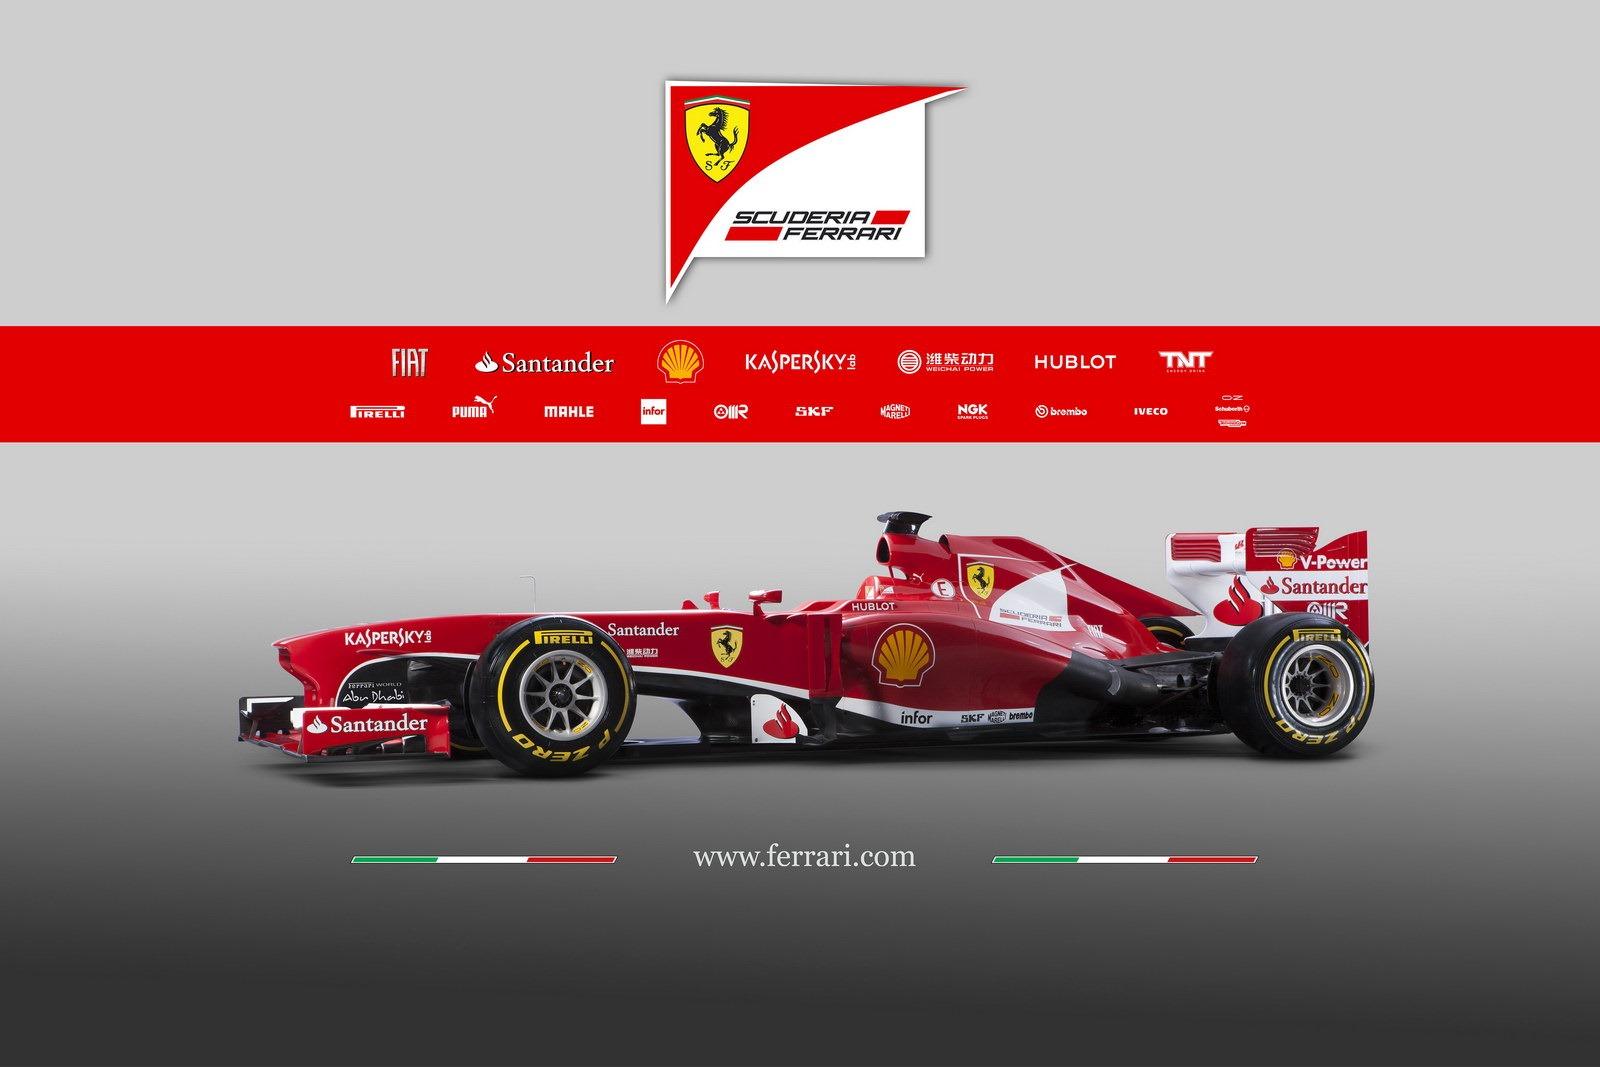 Ferrari Formula 1 Wallpaper Images Pictures   Findpik 1600x1067